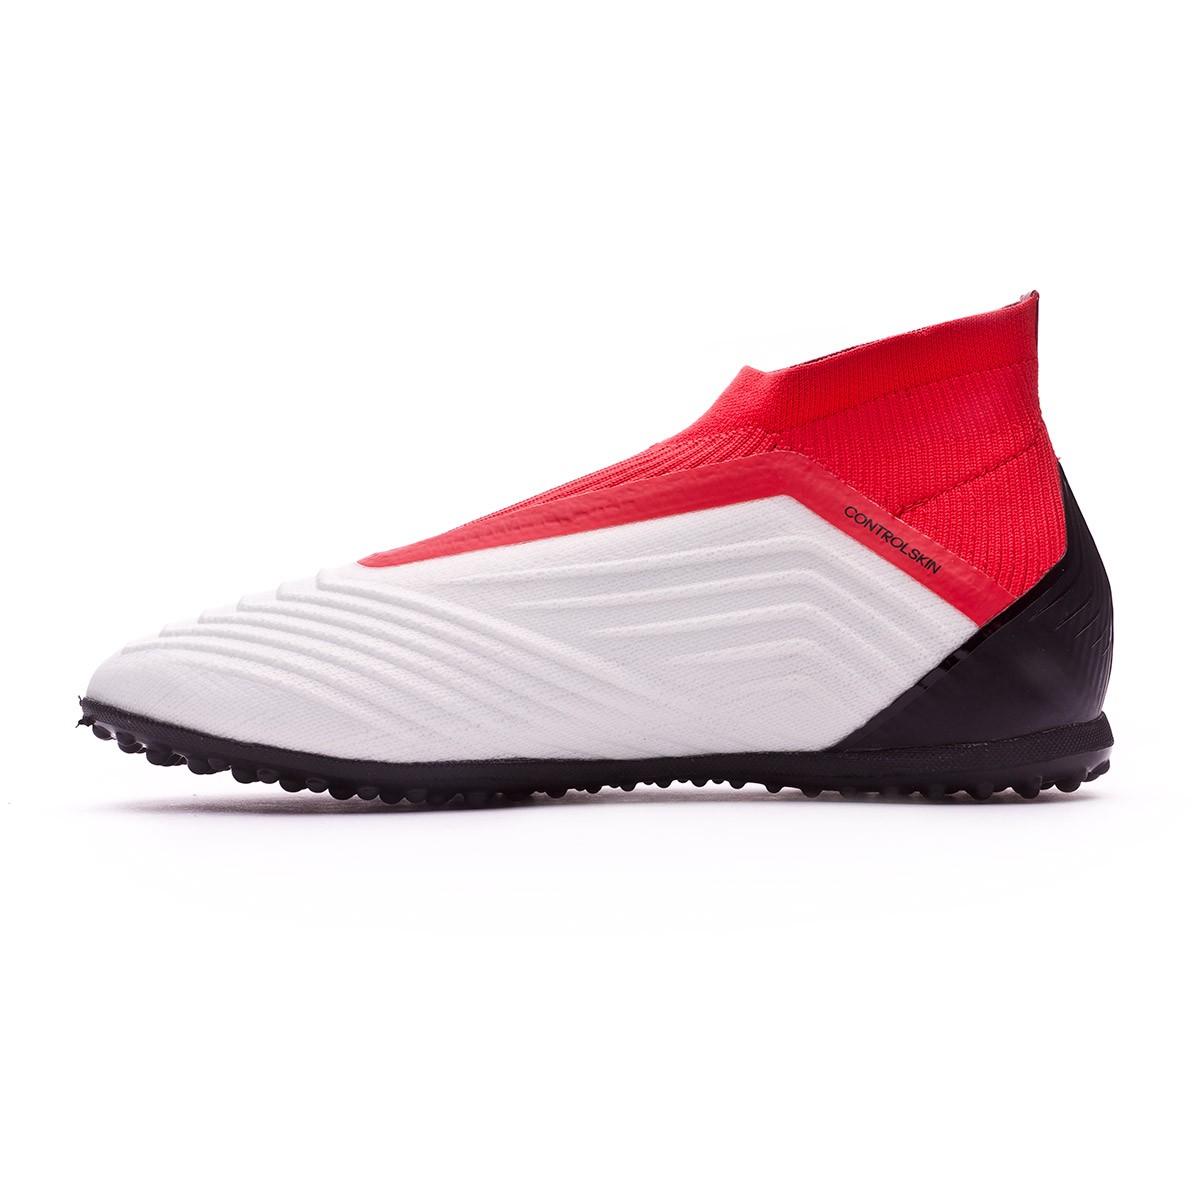 low priced a2207 70d38 Zapatilla adidas Predator Tango 18+ Turf Niño White-Core black-Real coral -  Soloporteros es ahora Fútbol Emotion